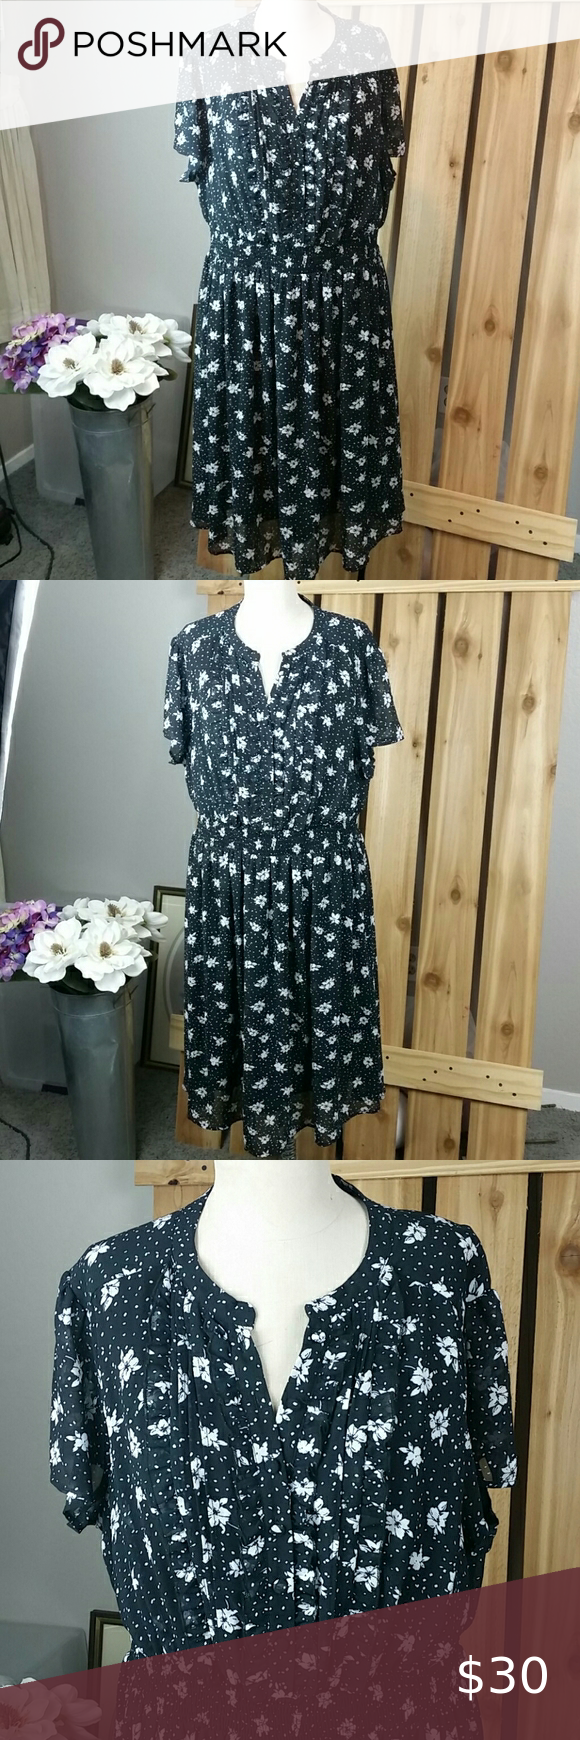 Torrid Floral Print Black Dress Black Print Dress Torrid Dresses Black Dress [ 1740 x 580 Pixel ]